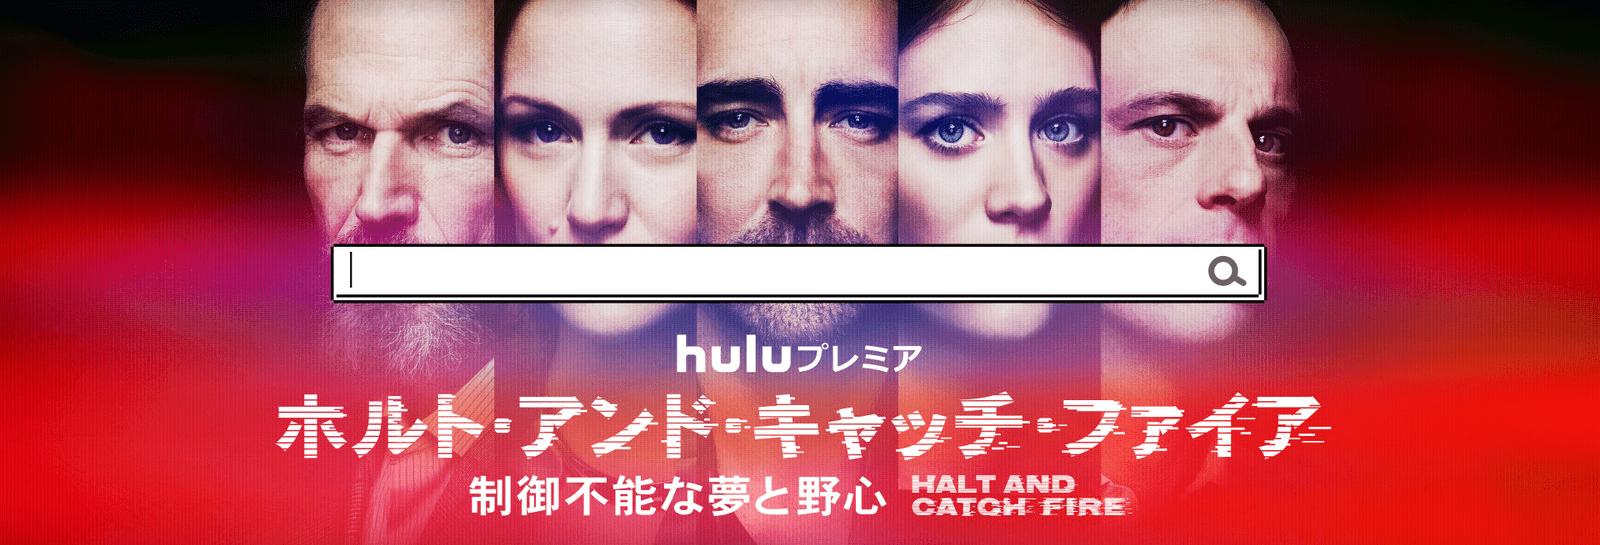 【Huluおすすめ海外ドラマ】Hulu(フールー)のおすすめ海外ドラマ作品一覧|ウォーキングデッド・ゲームオブスローンズ・Huluプレミア作品など充実!|Huluプレミア編:ホルト・アンド・キャッチ・ファイア 制御不能な夢と野心